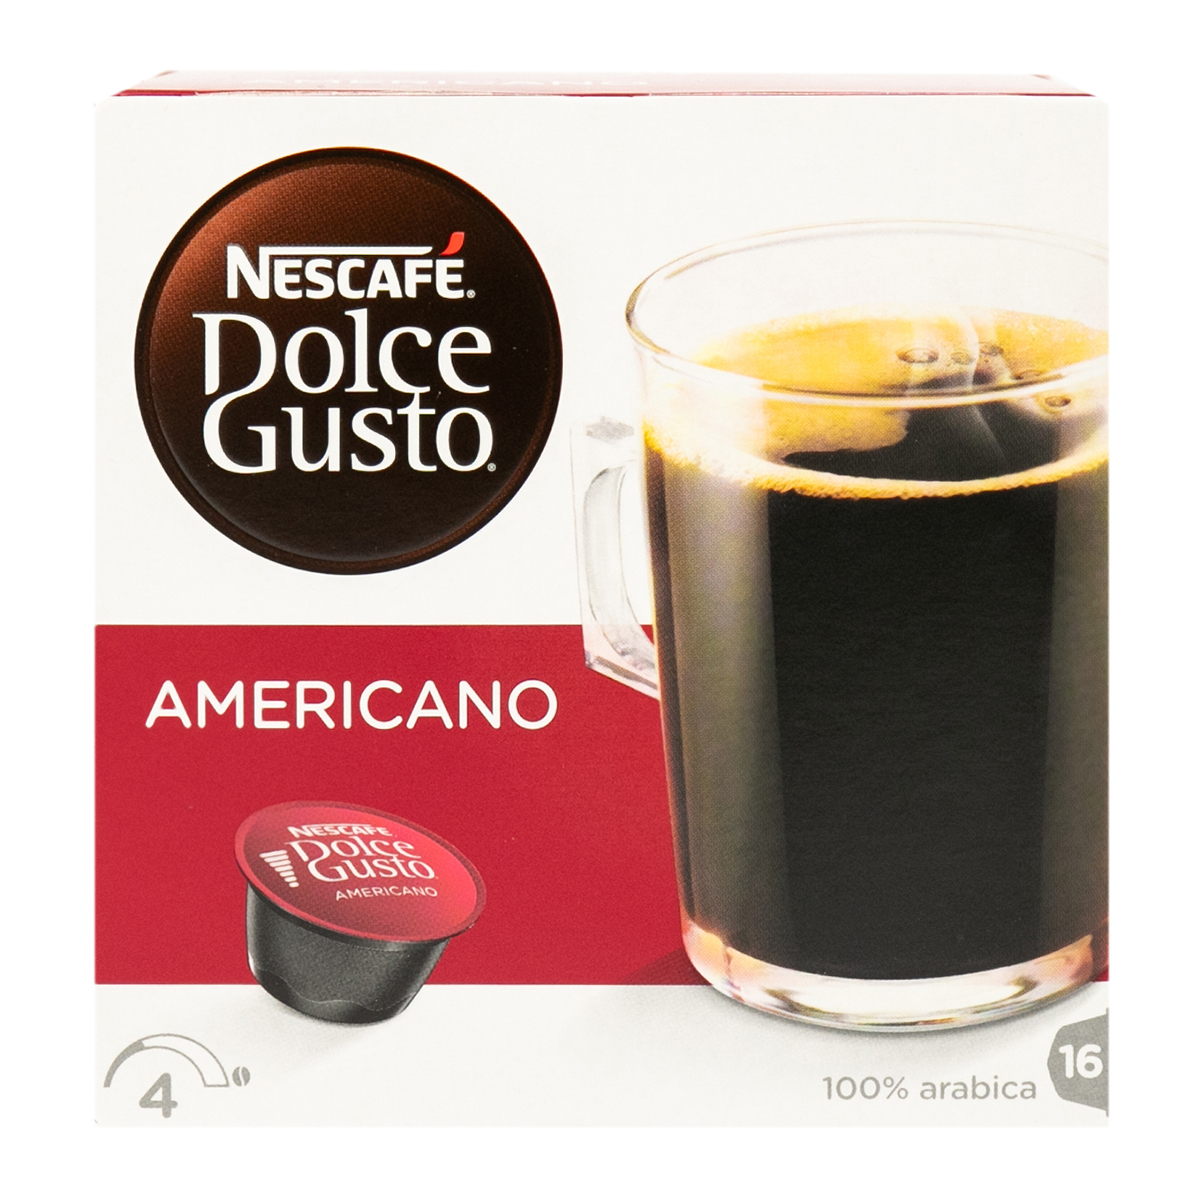 Nescafe Dolche Gusto американо